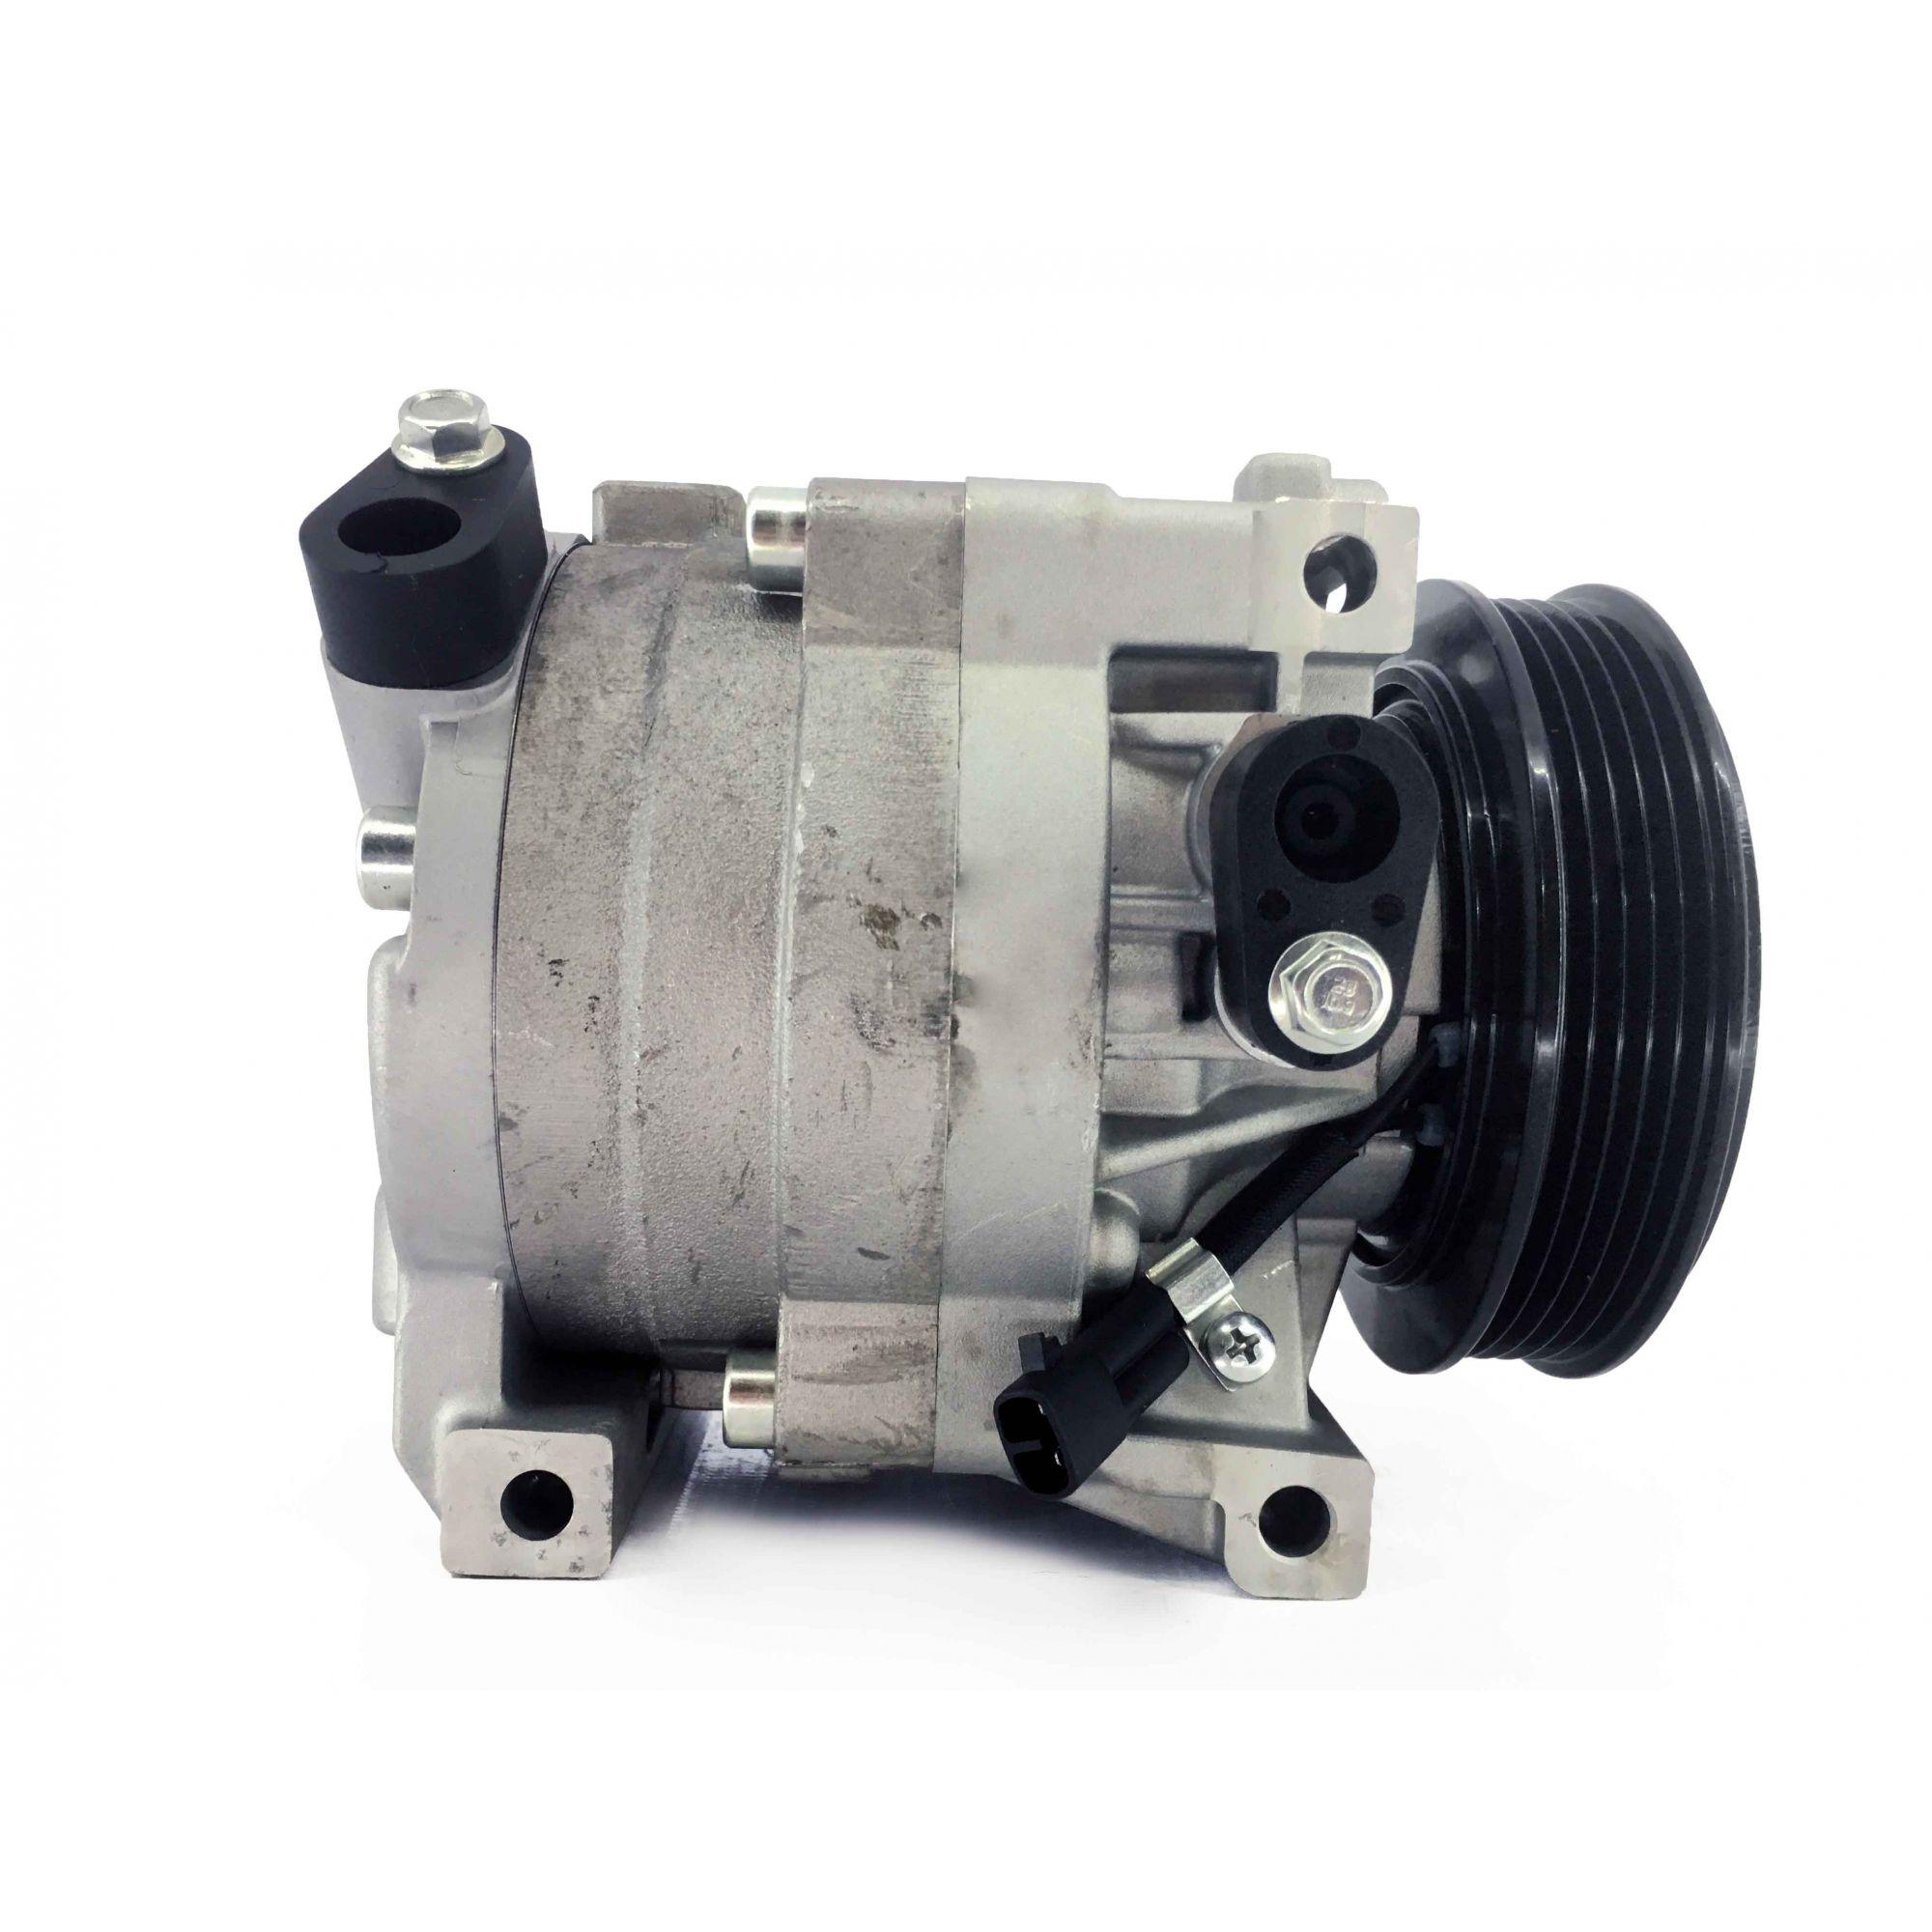 Compressor Punto / Palio / Siena / Doblô - Original DELPHI